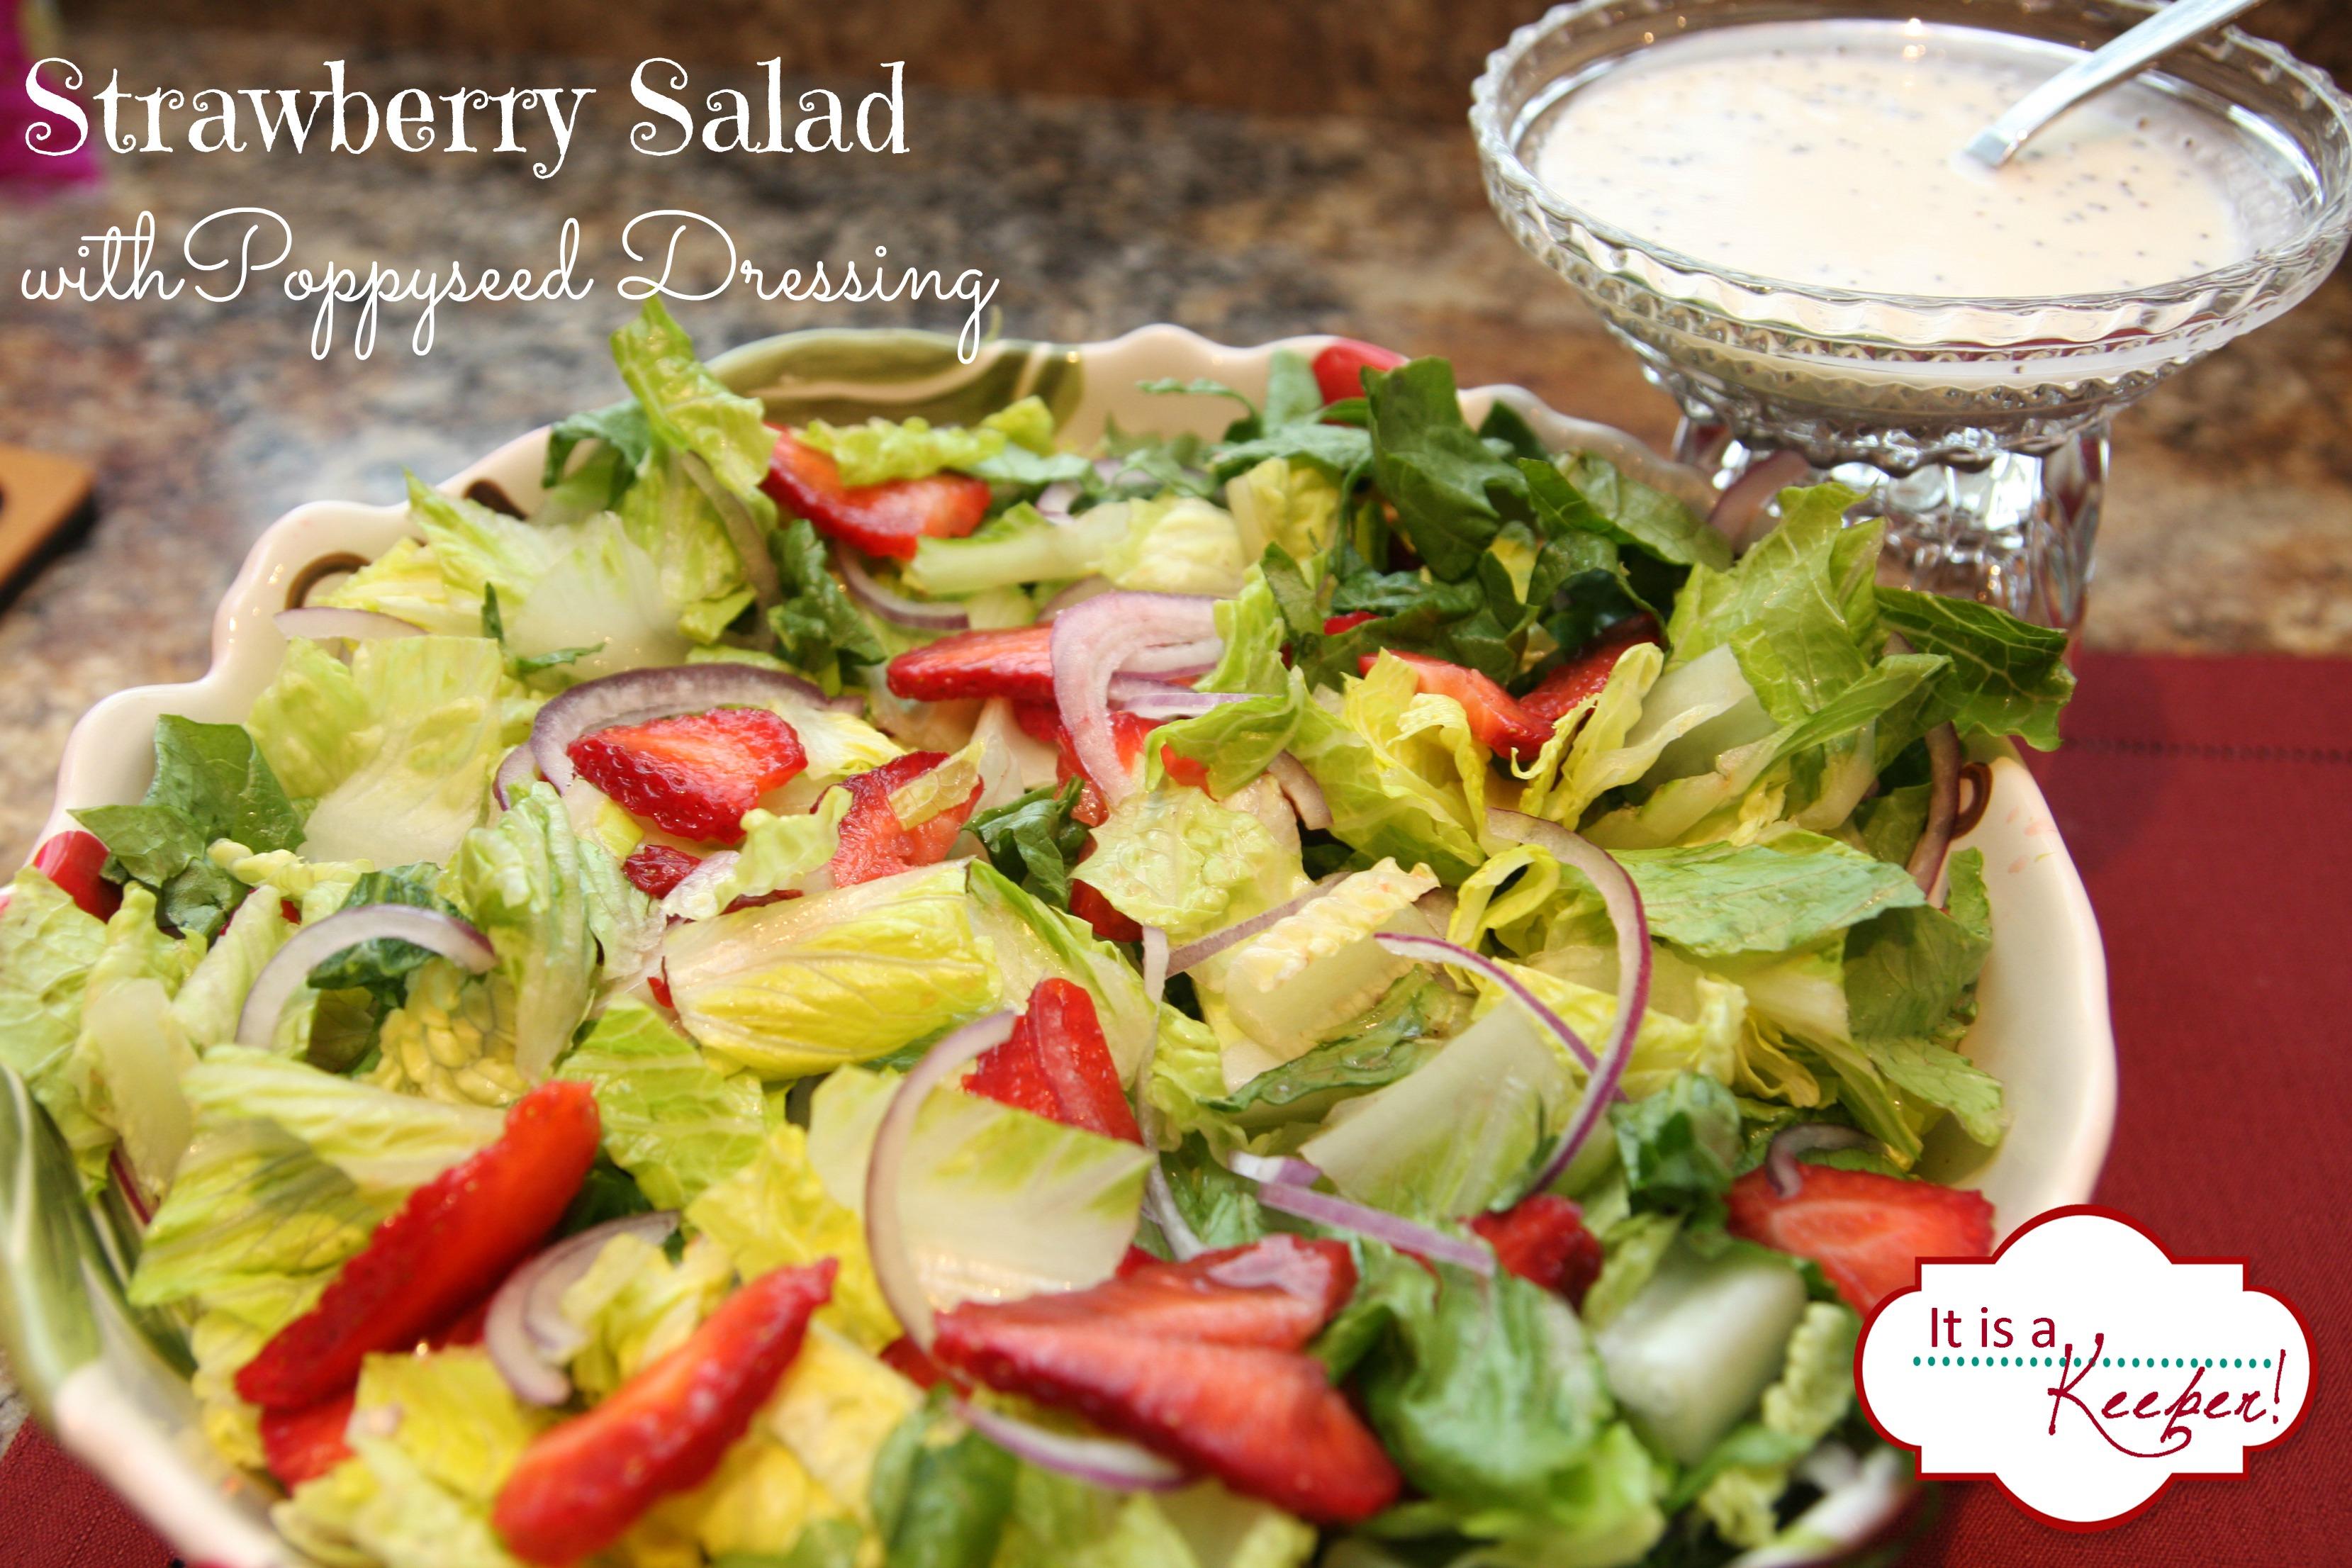 Strawberry Salad with Creamy Poppy Seed Dressing